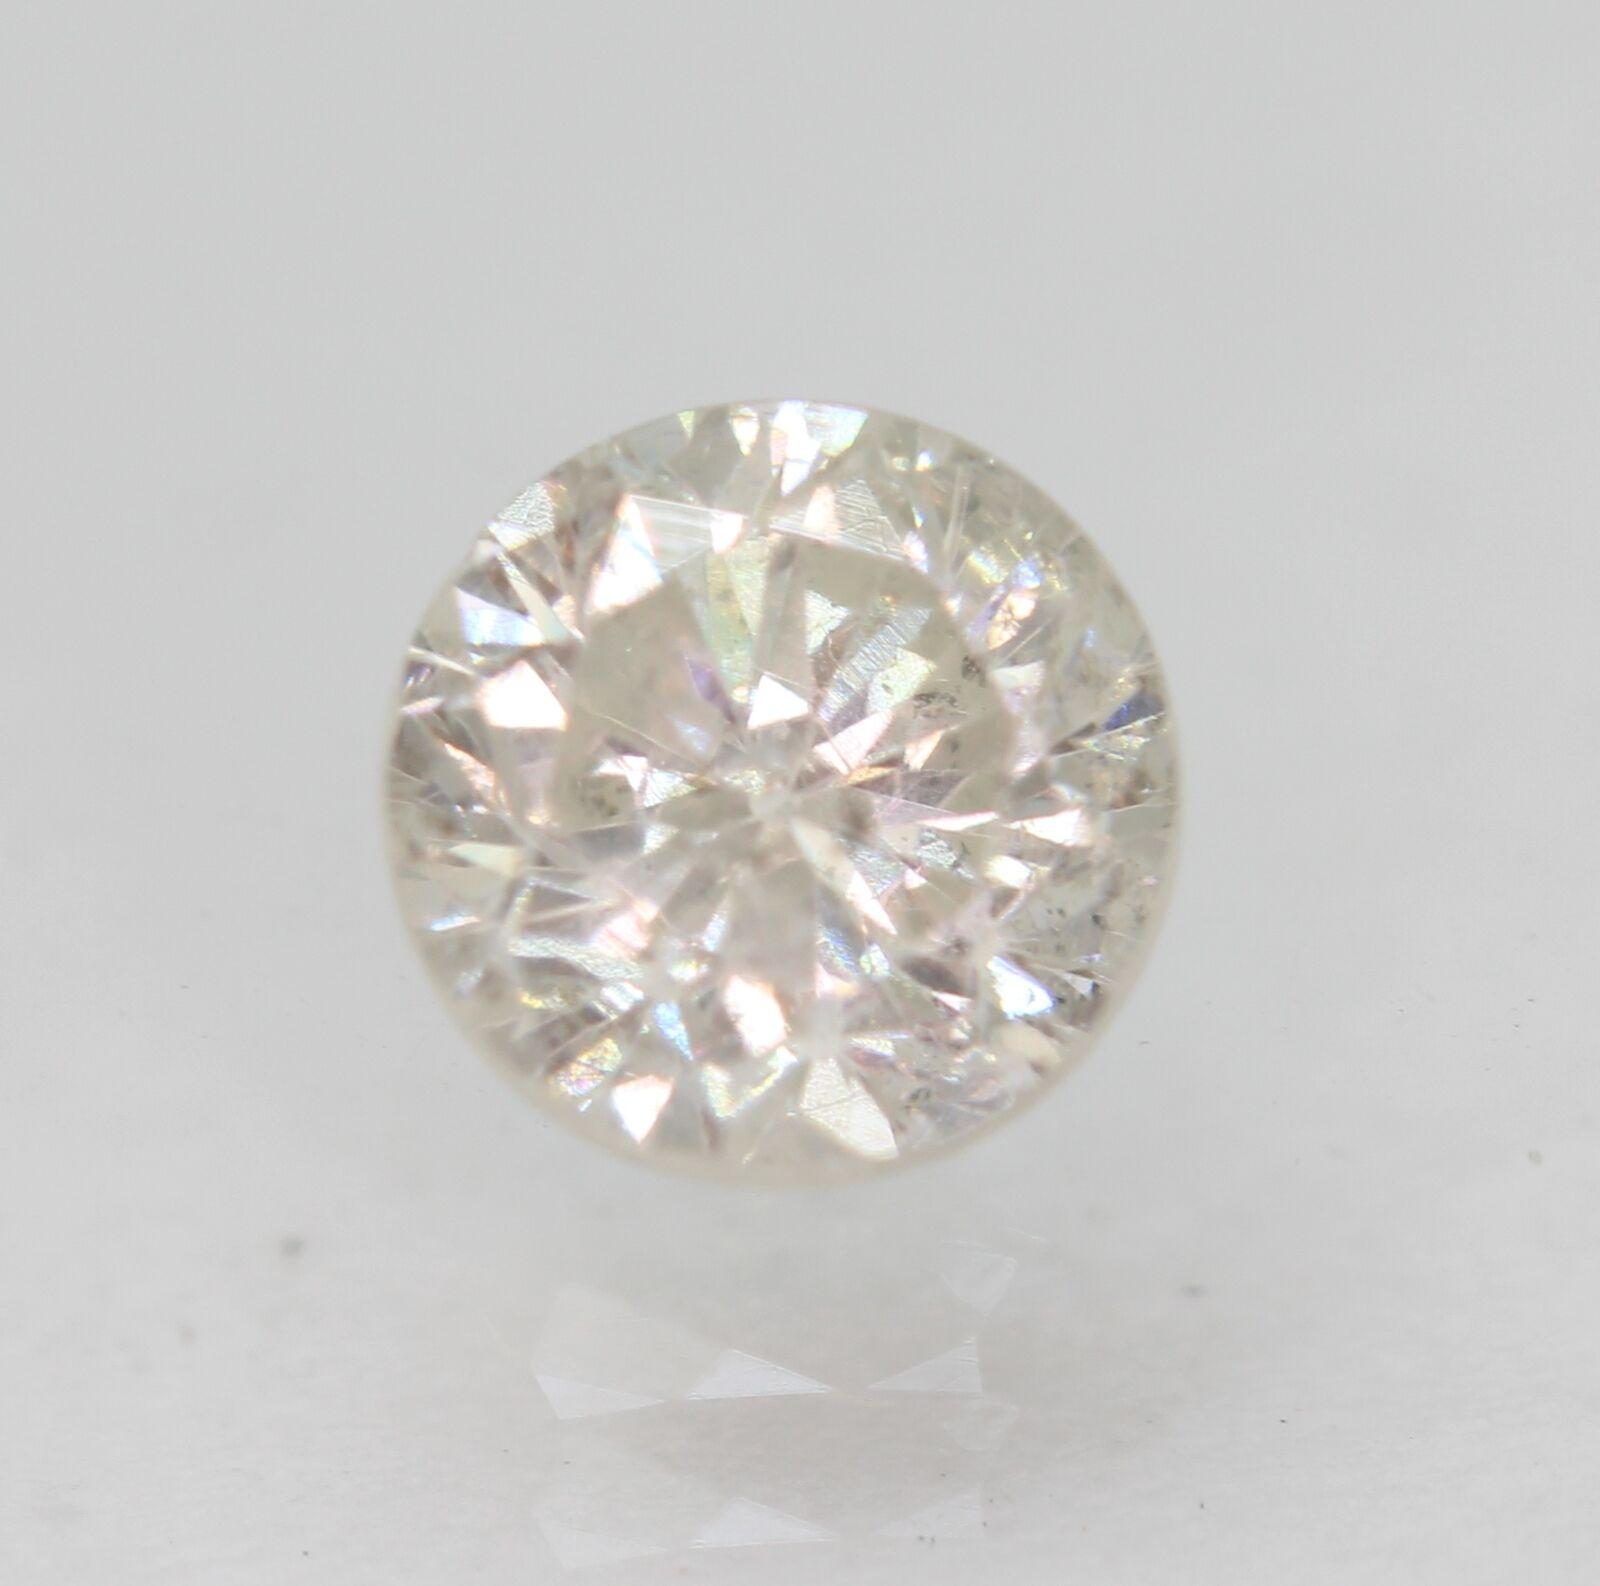 Certified 0.78 Carat H SI2 Round Brilliant Natural Loose Diamond 5.55mm